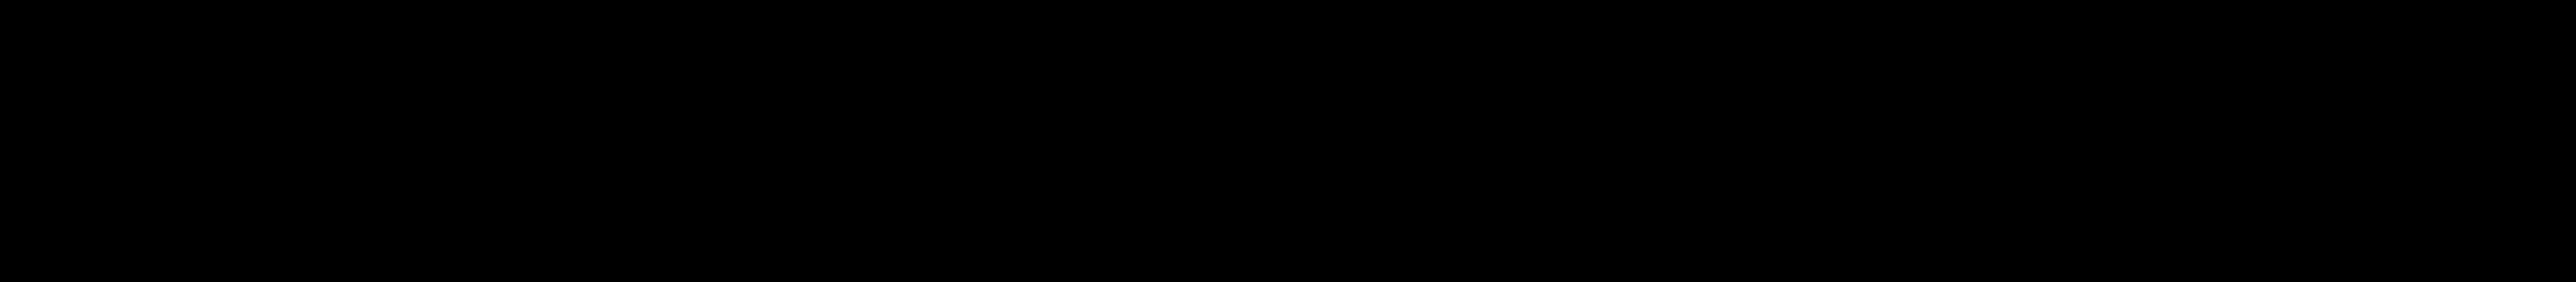 Dave Adriaanse - Media logo